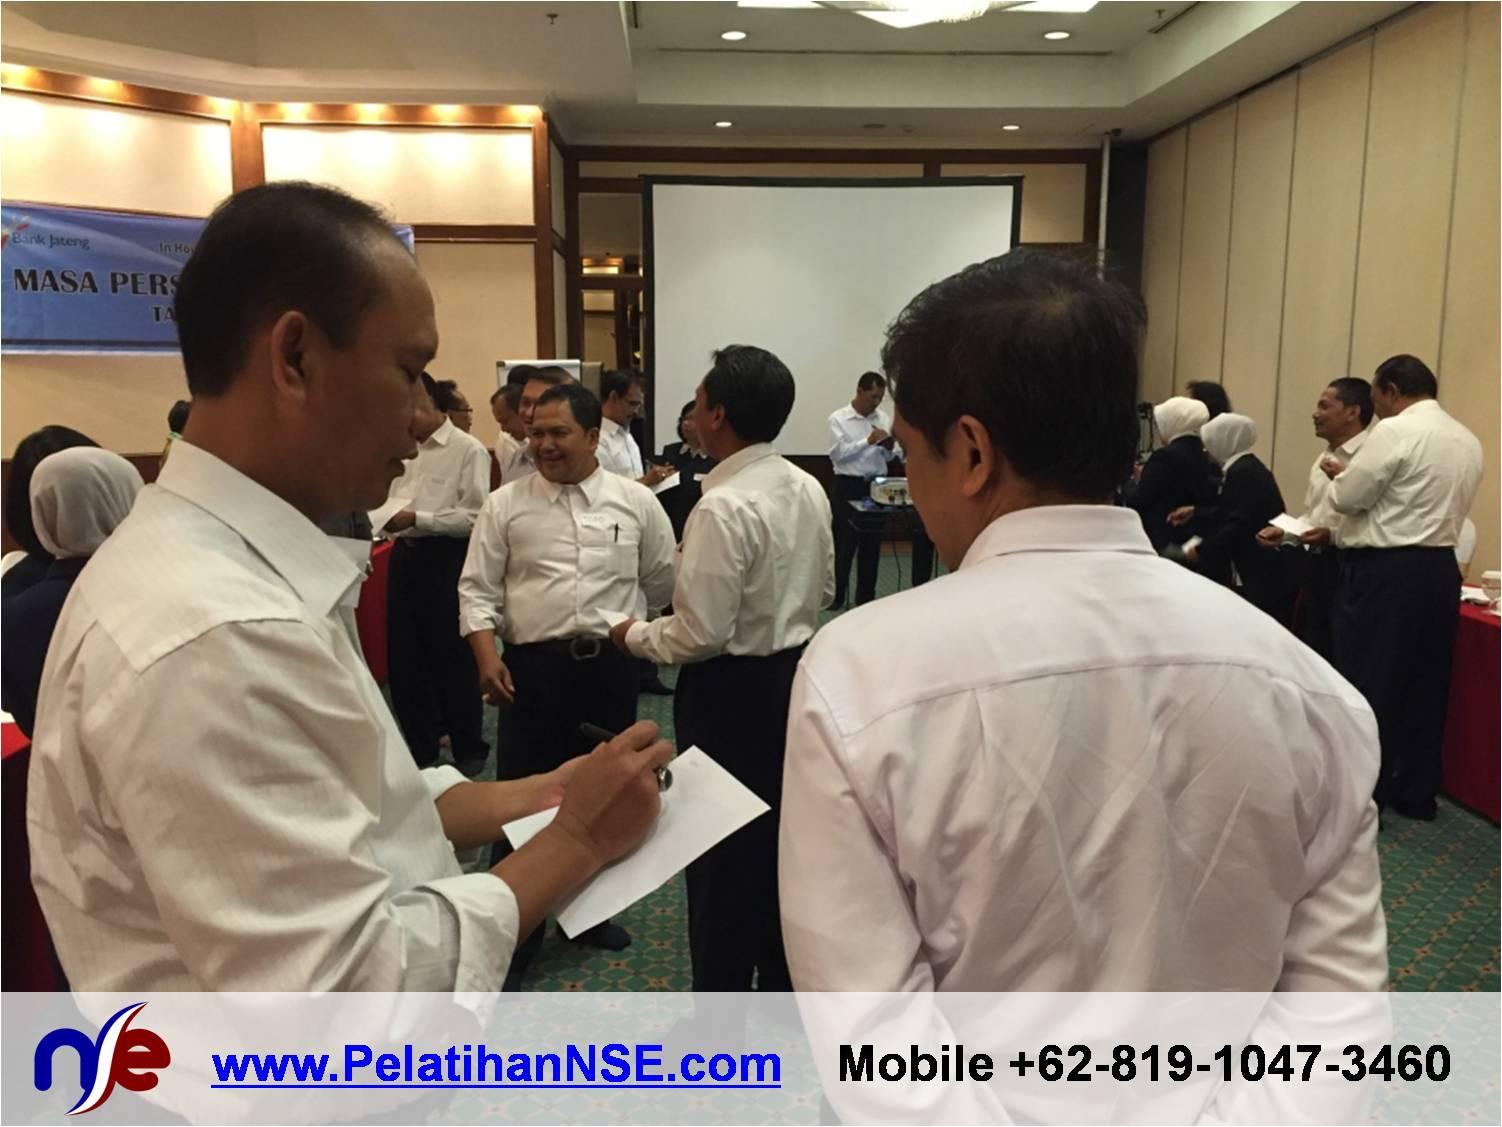 Retiree Empowerment - Bank Jateng - Menebak Dosha rekan sesama calon pensiunan